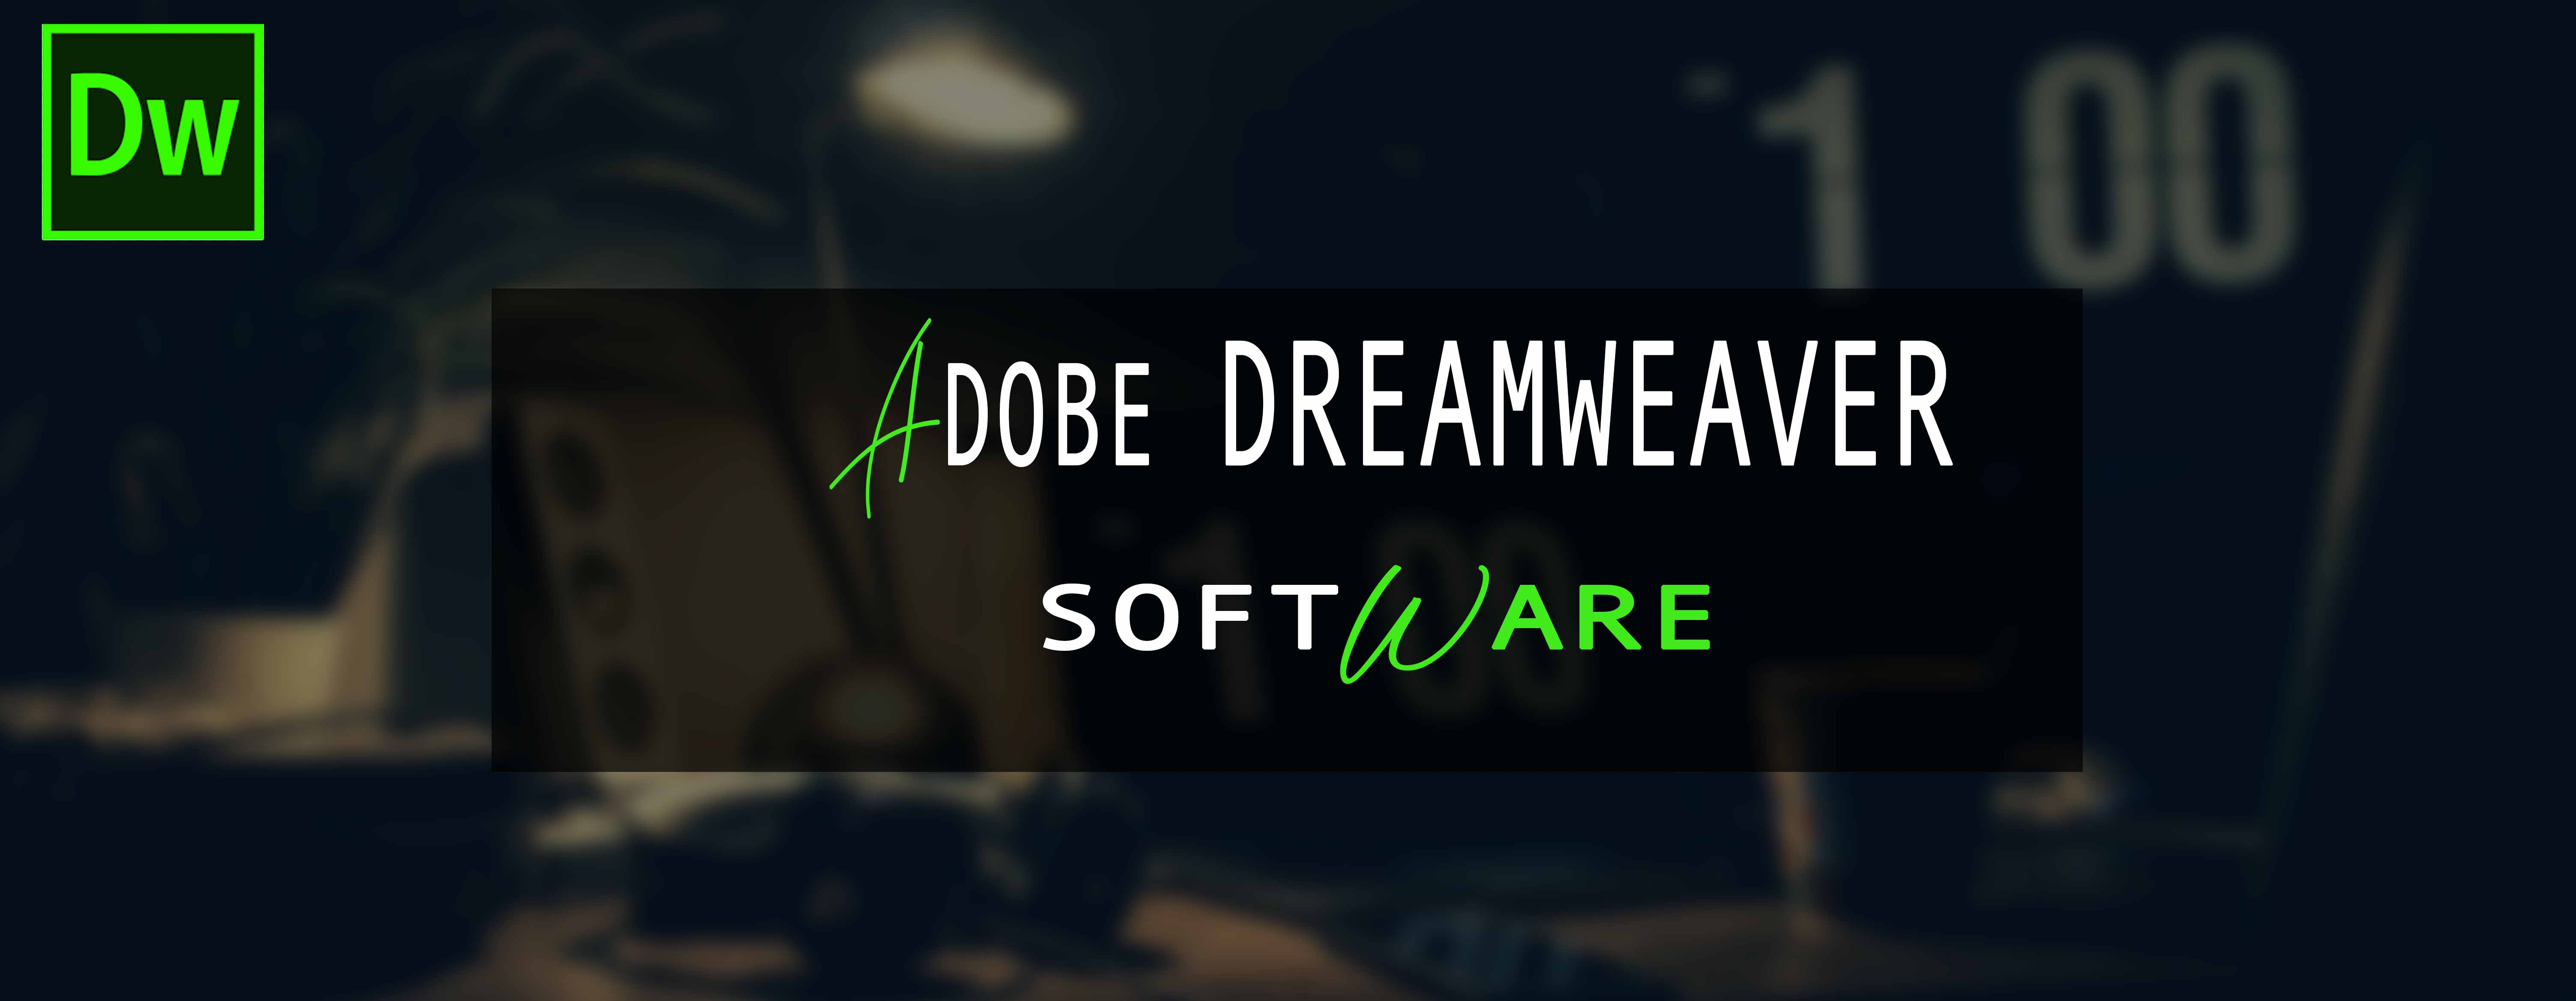 Adobe Dreamweaver Cs5 Download